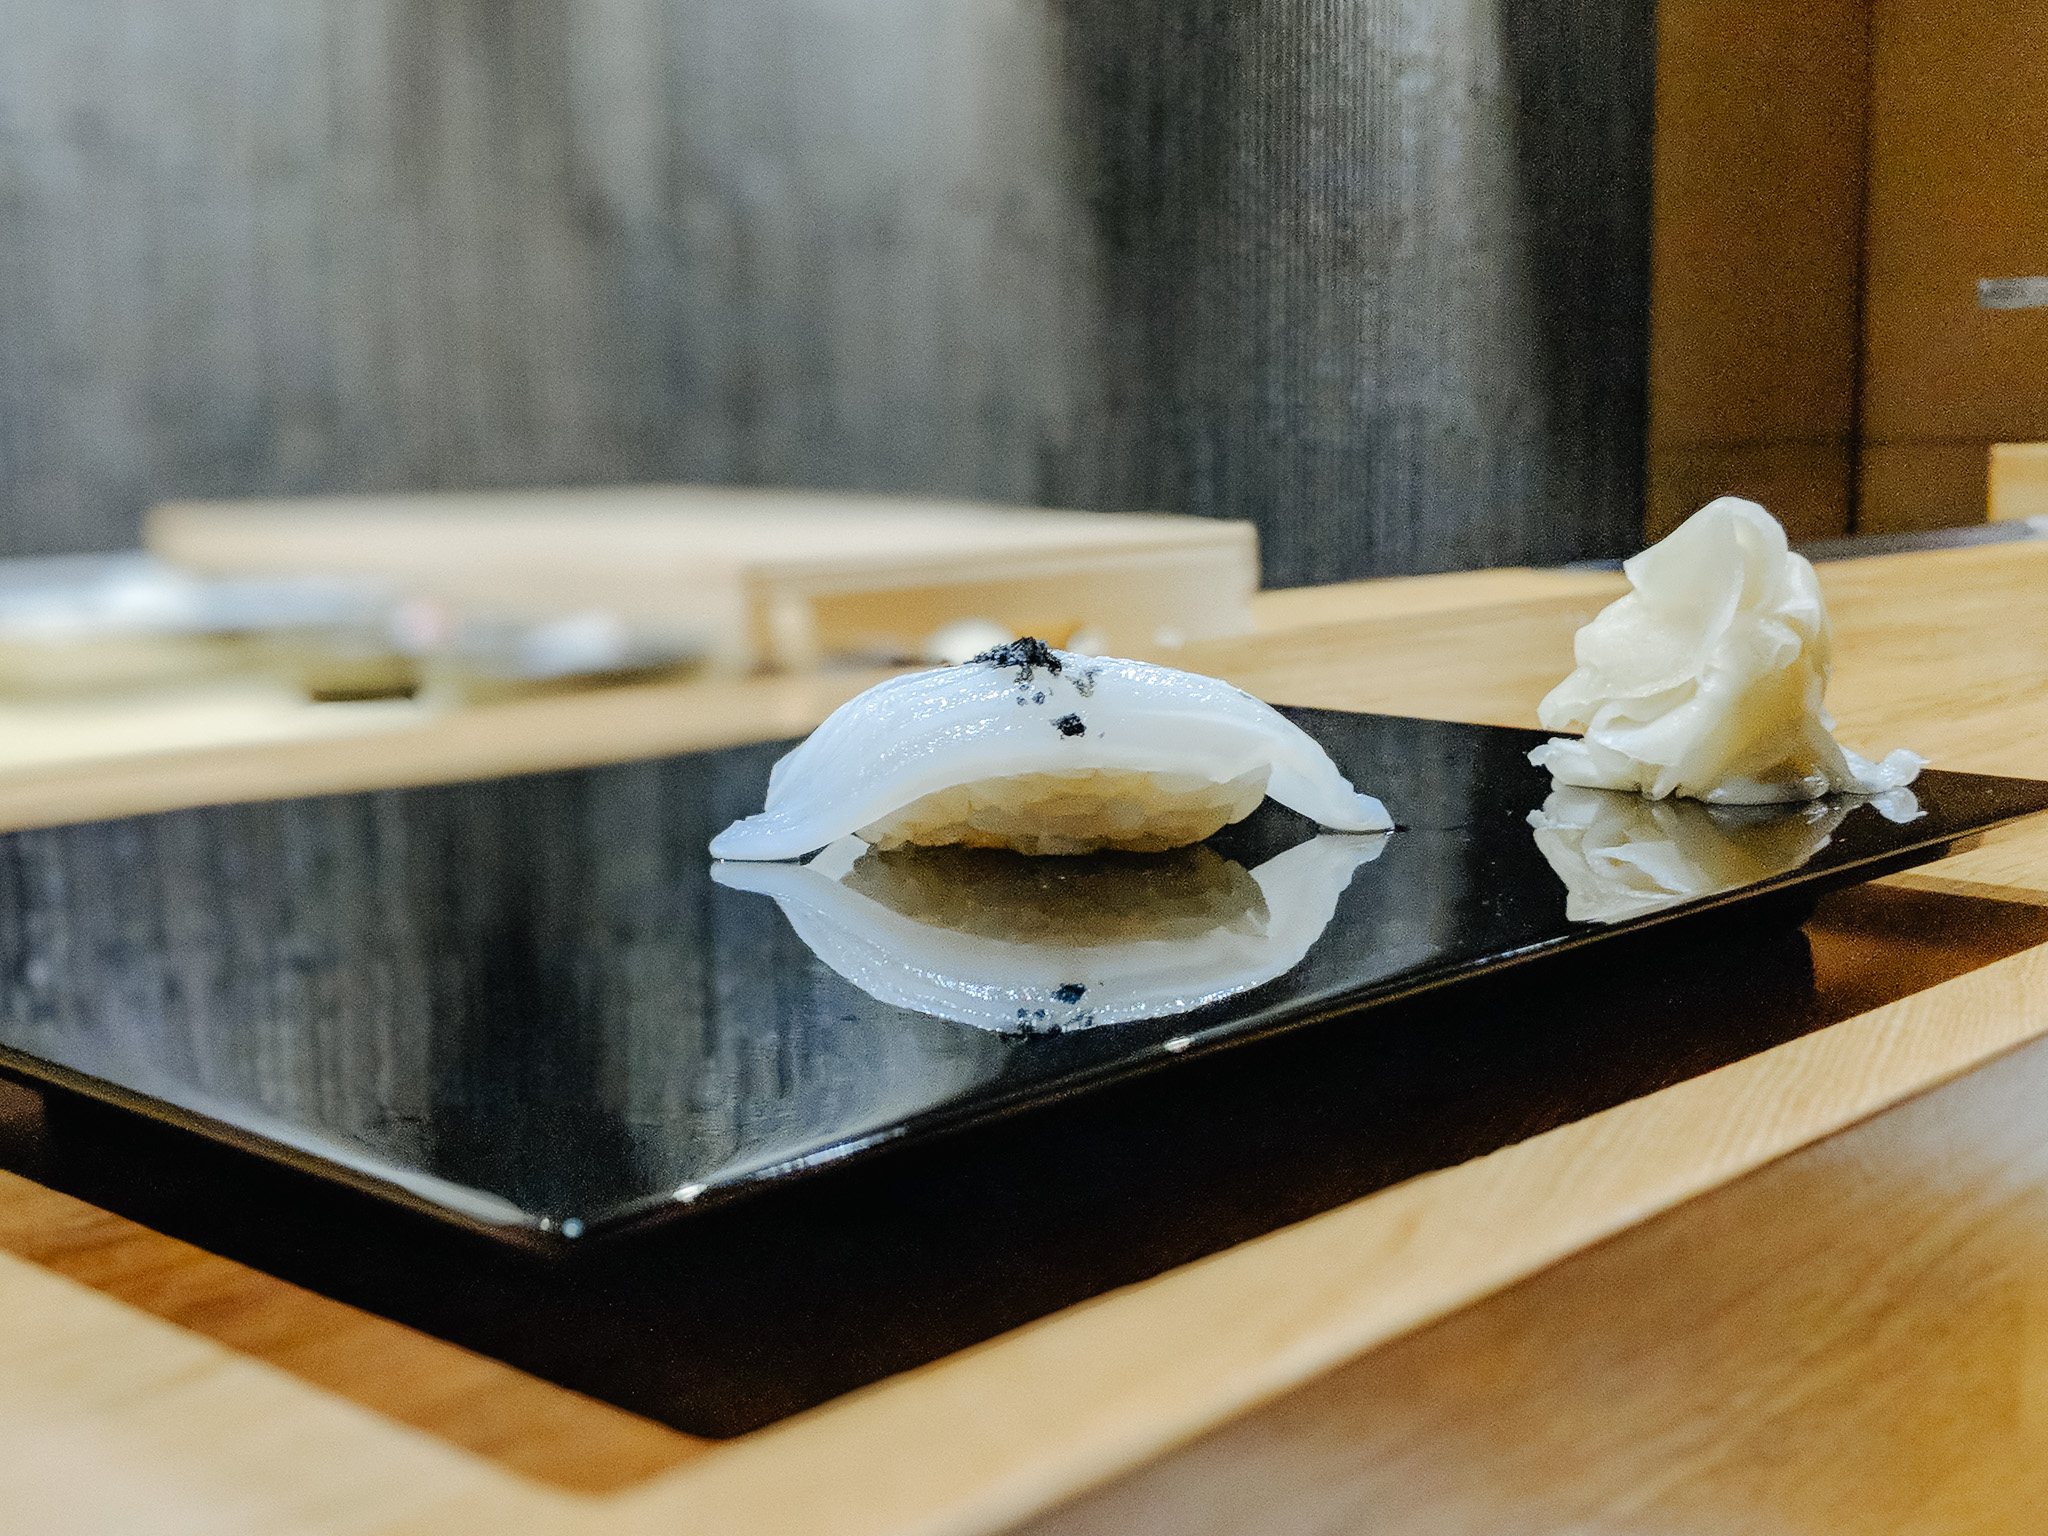 minamishima-melbourne-food-photographer-006.JPG